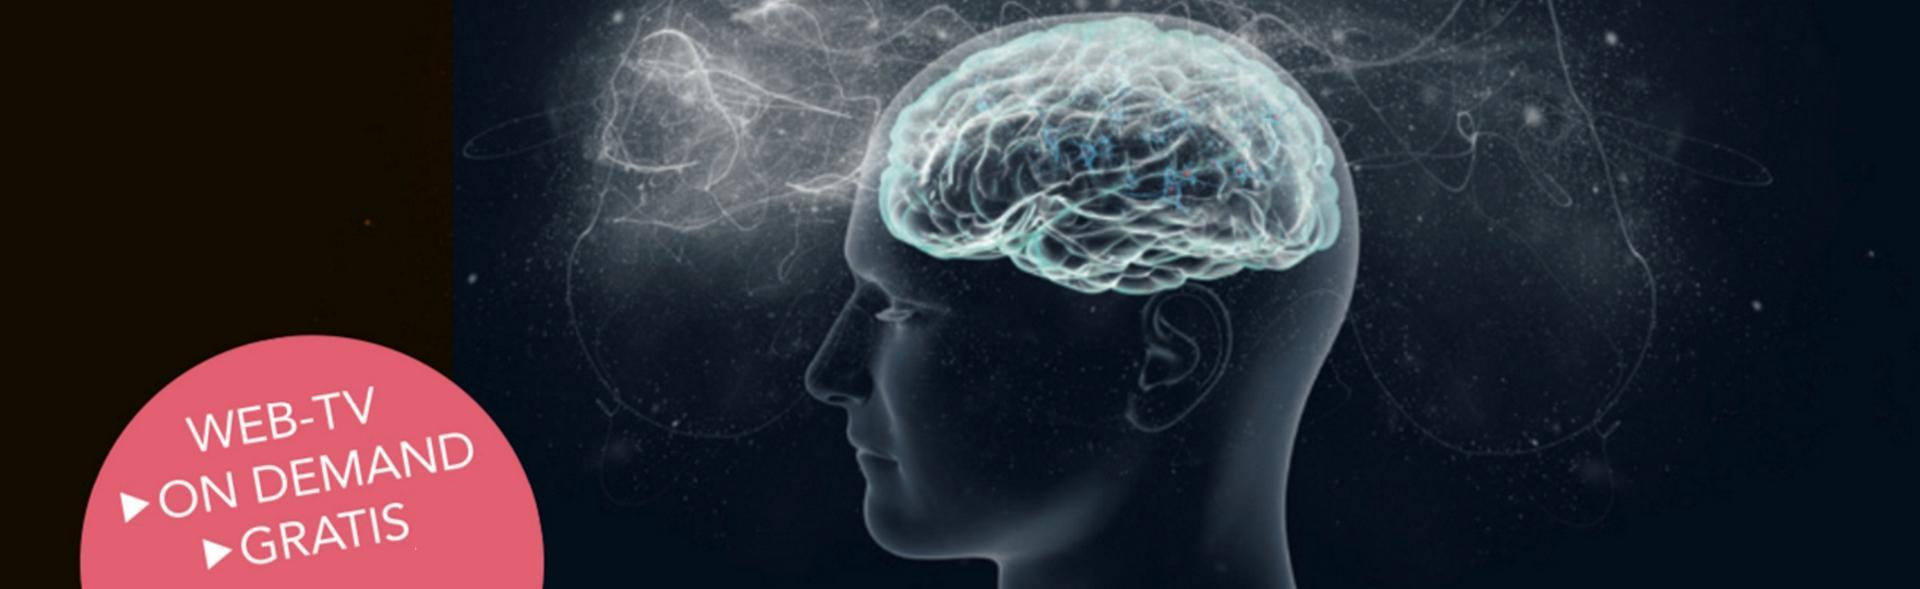 Webcast: SPMS en MRI